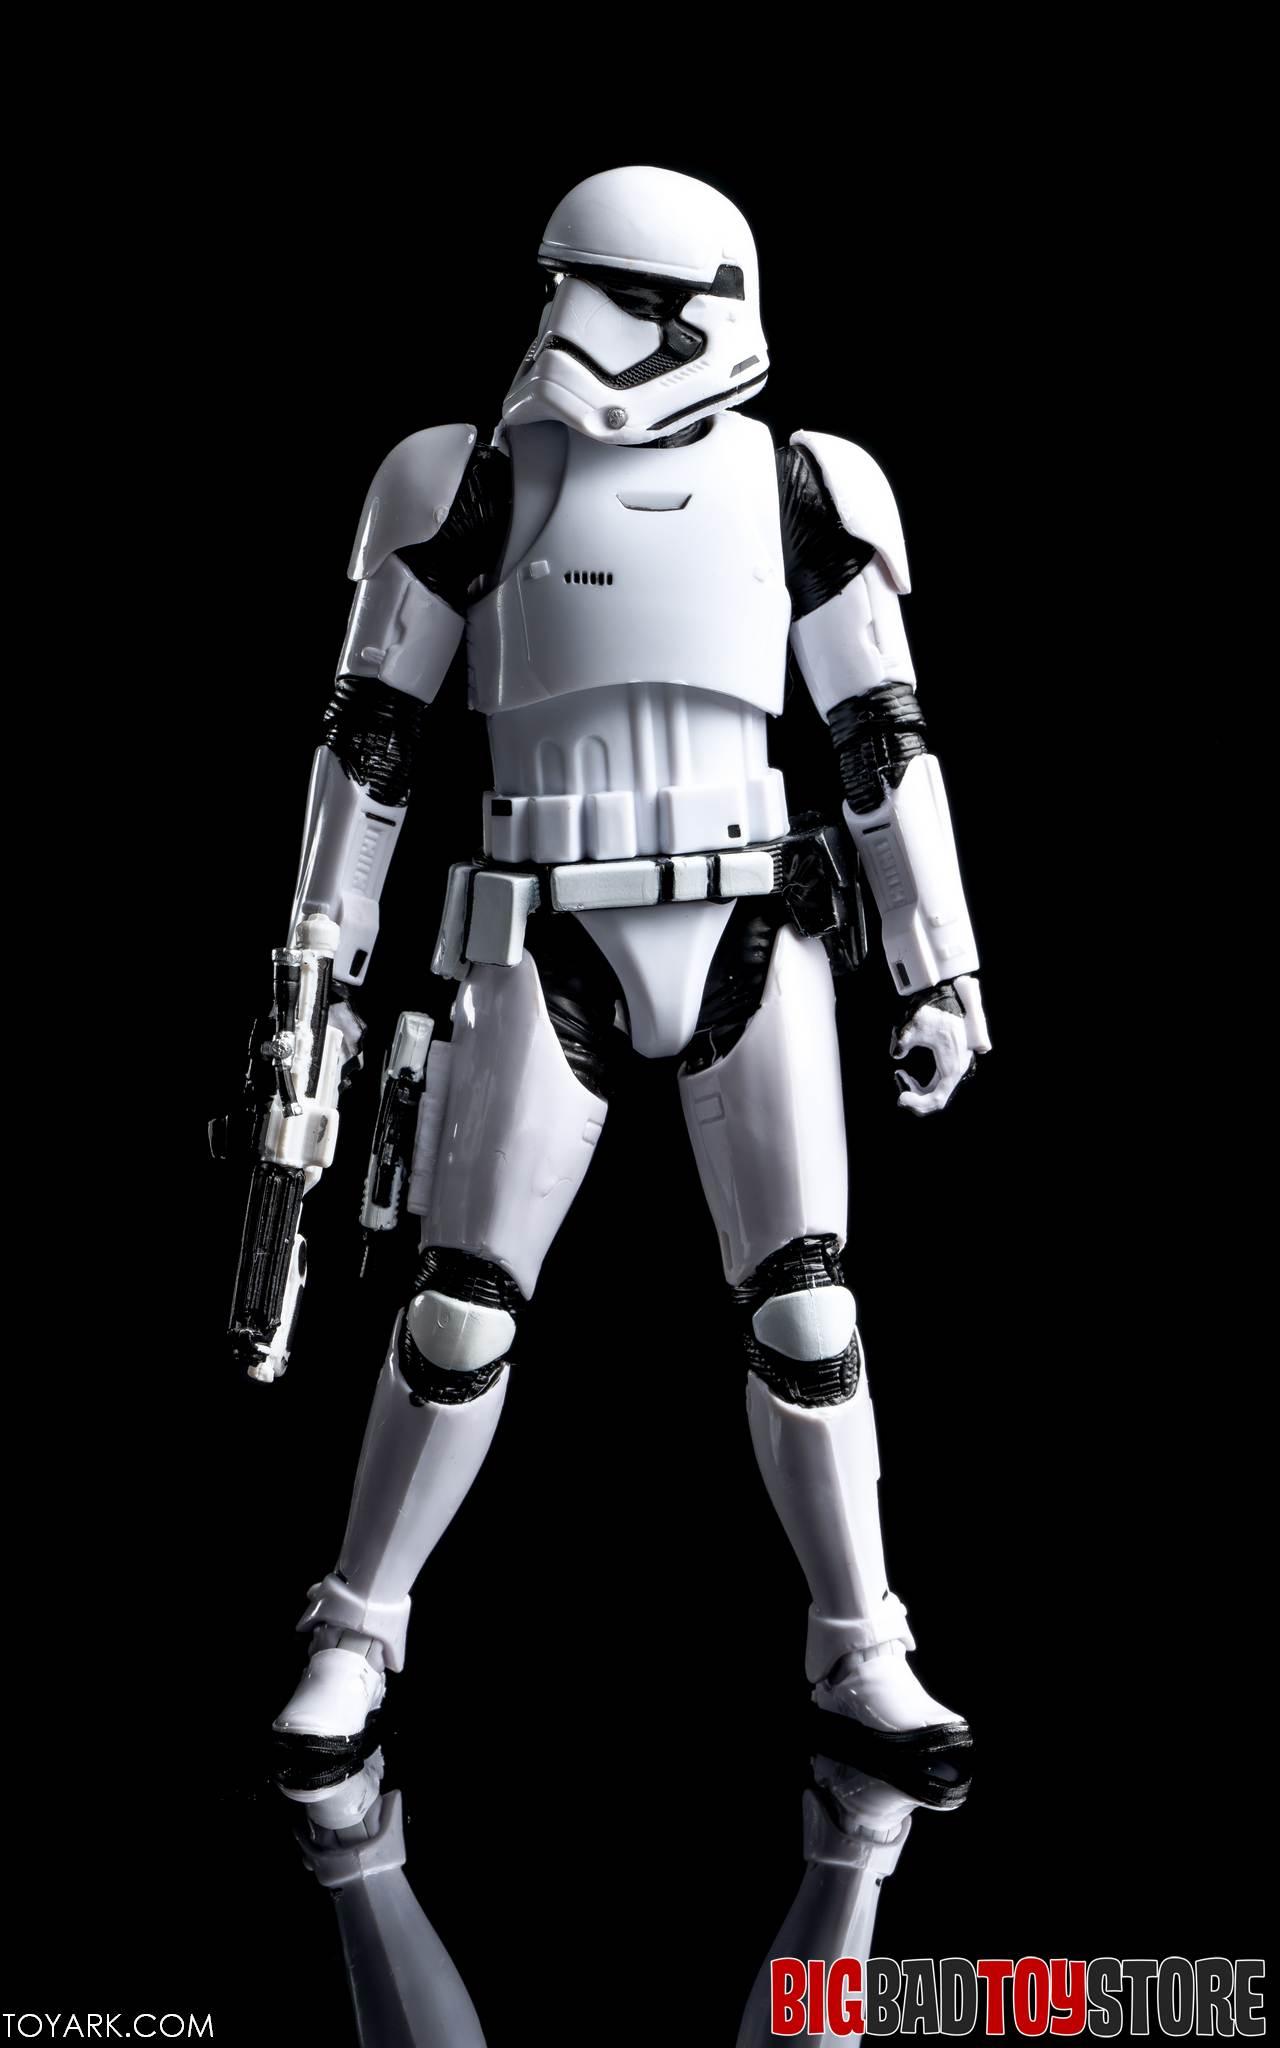 Series Order First Black Stormtrooper